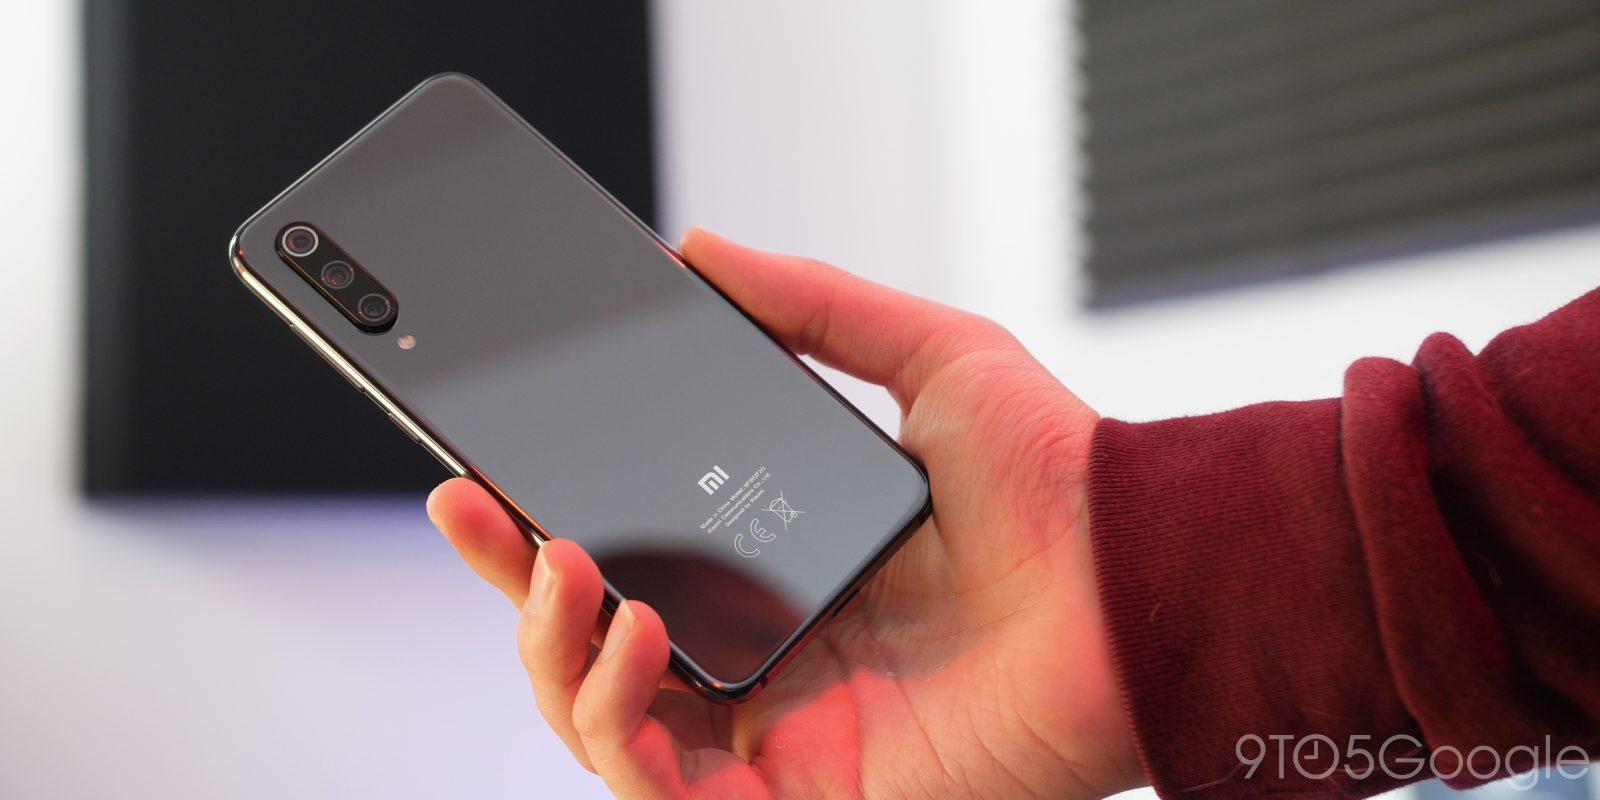 Xiaomi Mi 9 SE review: A real Pixel 3a rival [Video] - 9to5Google